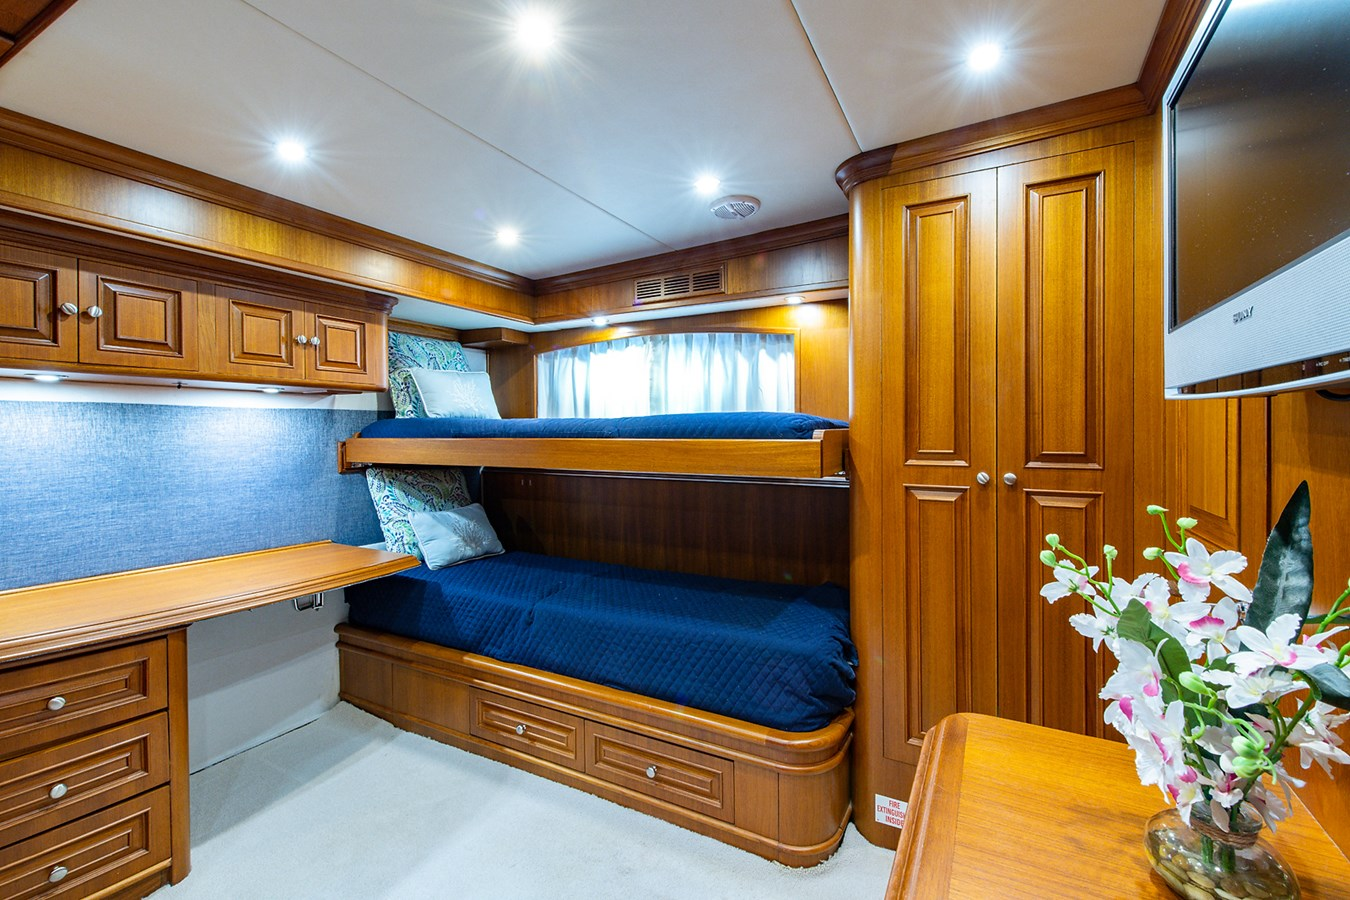 Tout Va Bien_Guest Stateroom-Den2 2005 GRAND BANKS 64 Aleutian RP Motor Yacht 2726151